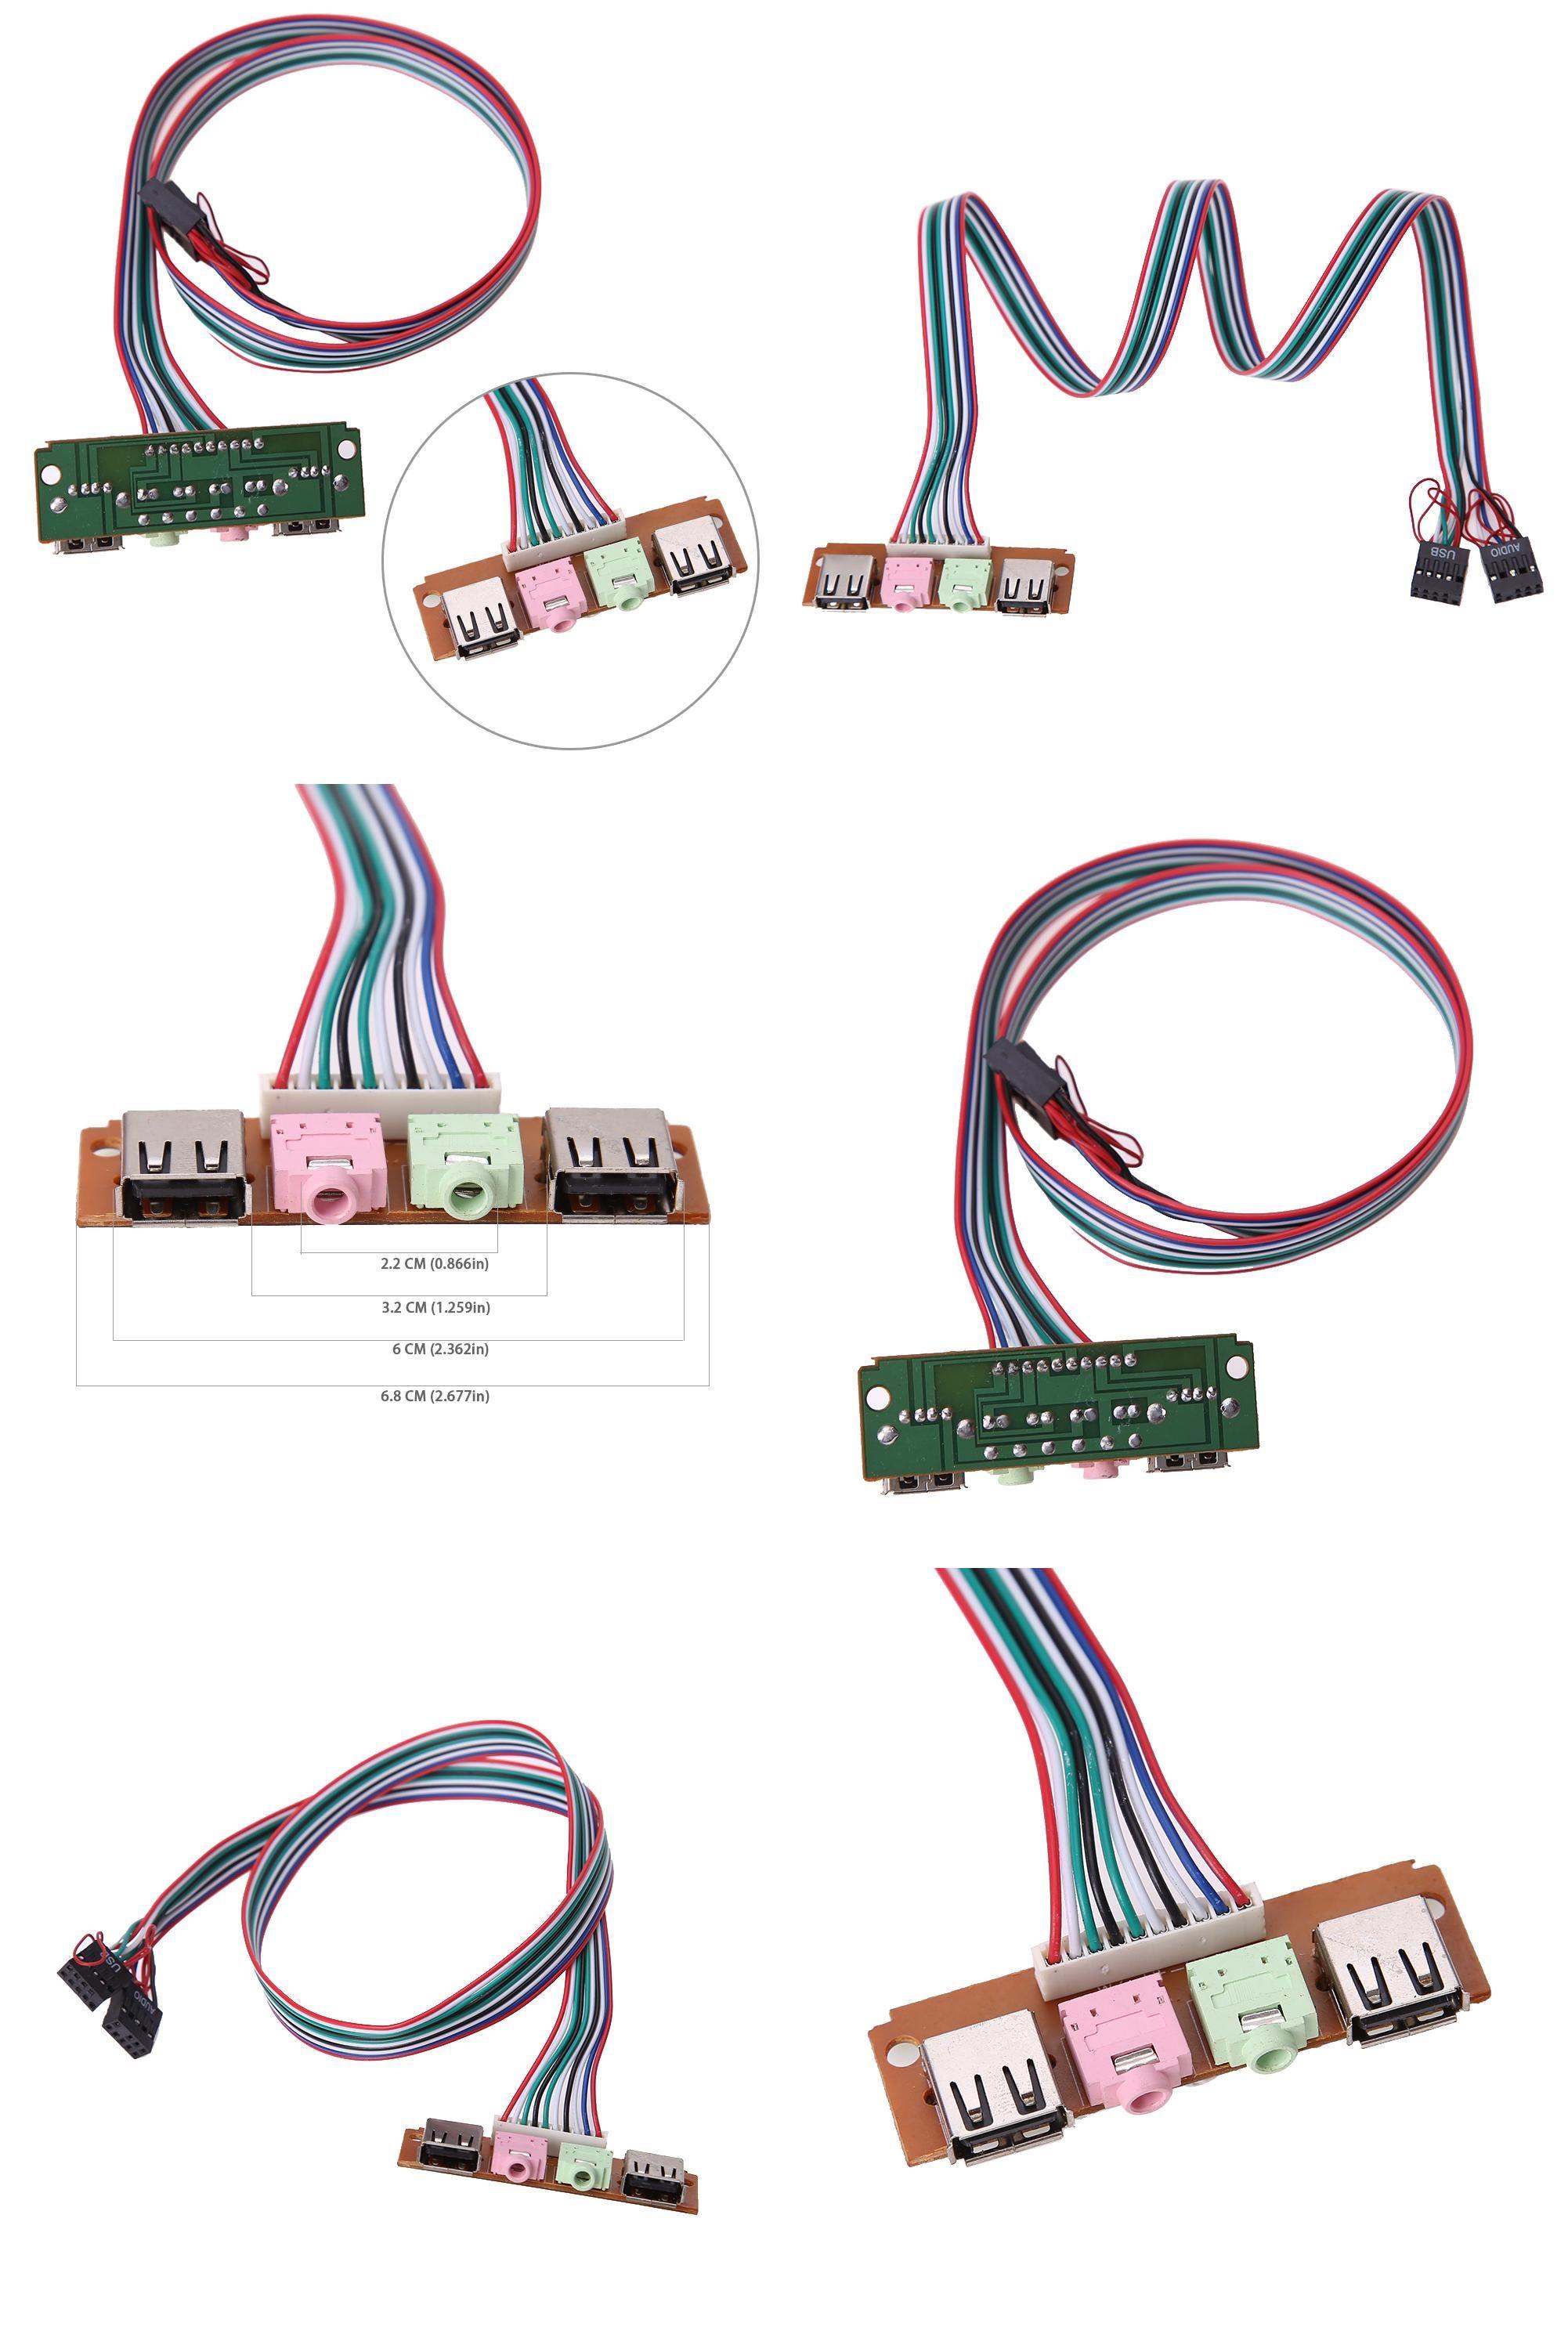 visit to buy 2 ports usb 2 0 pc computer case front panel usb audio jacks port mic earphone cable fw1s advertisement [ 2002 x 3003 Pixel ]